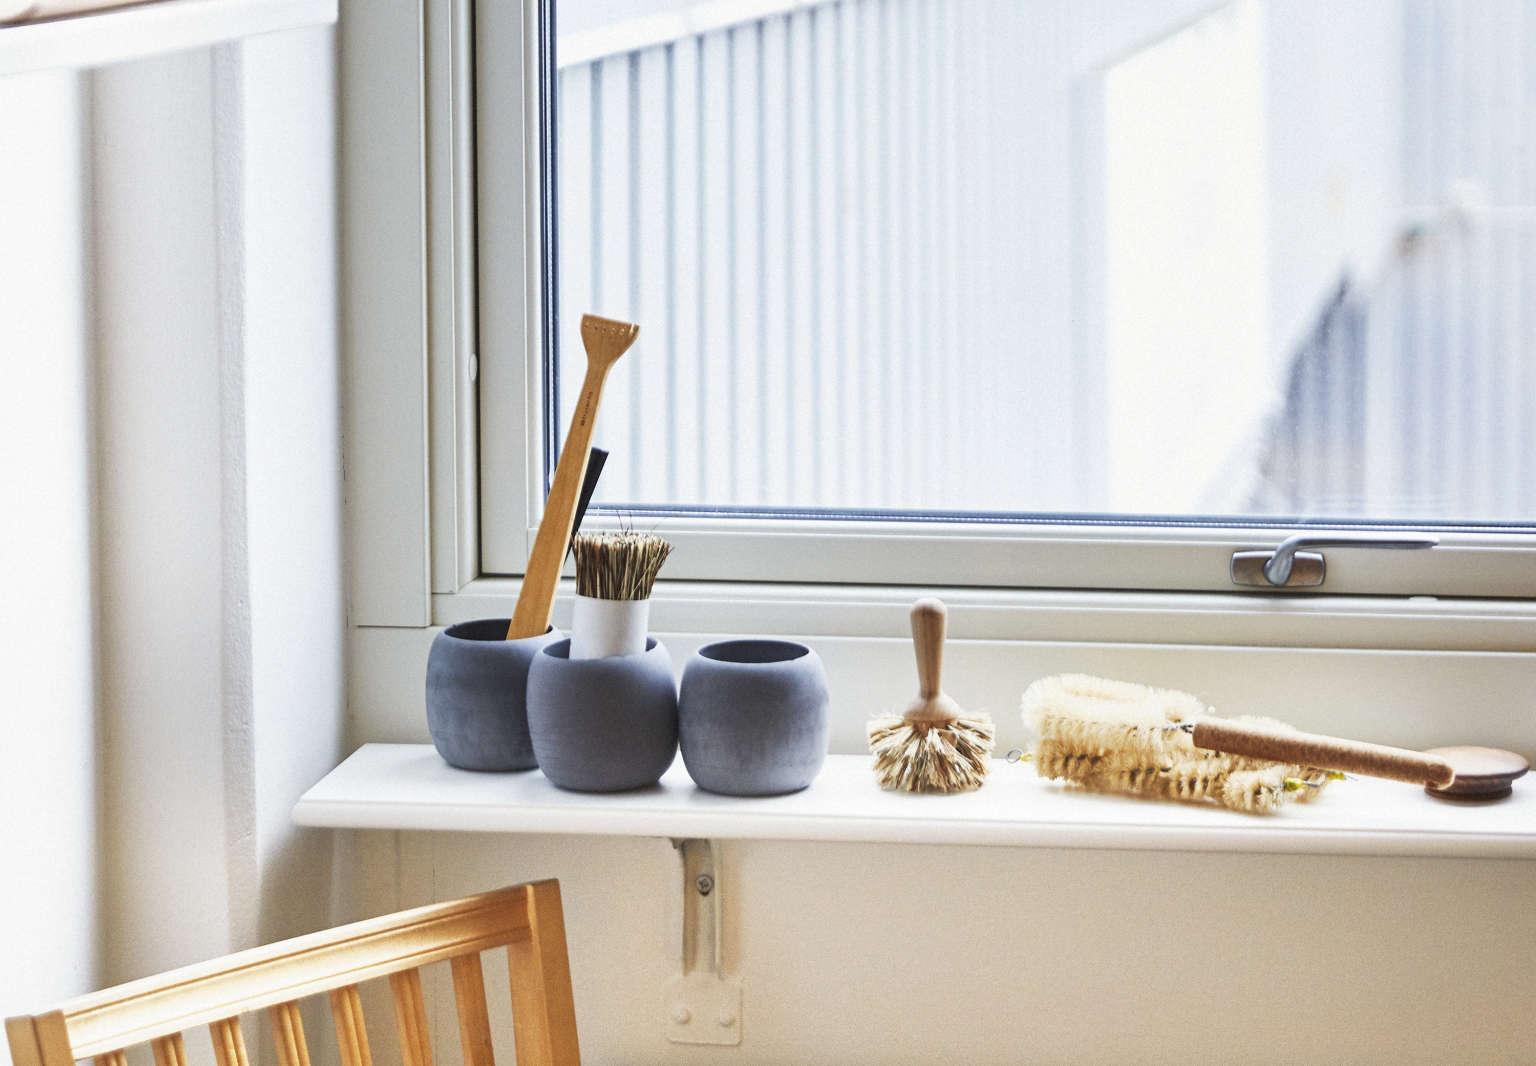 Aha Hack A Simple Diy Shelf As Window Ledge The Organized Home